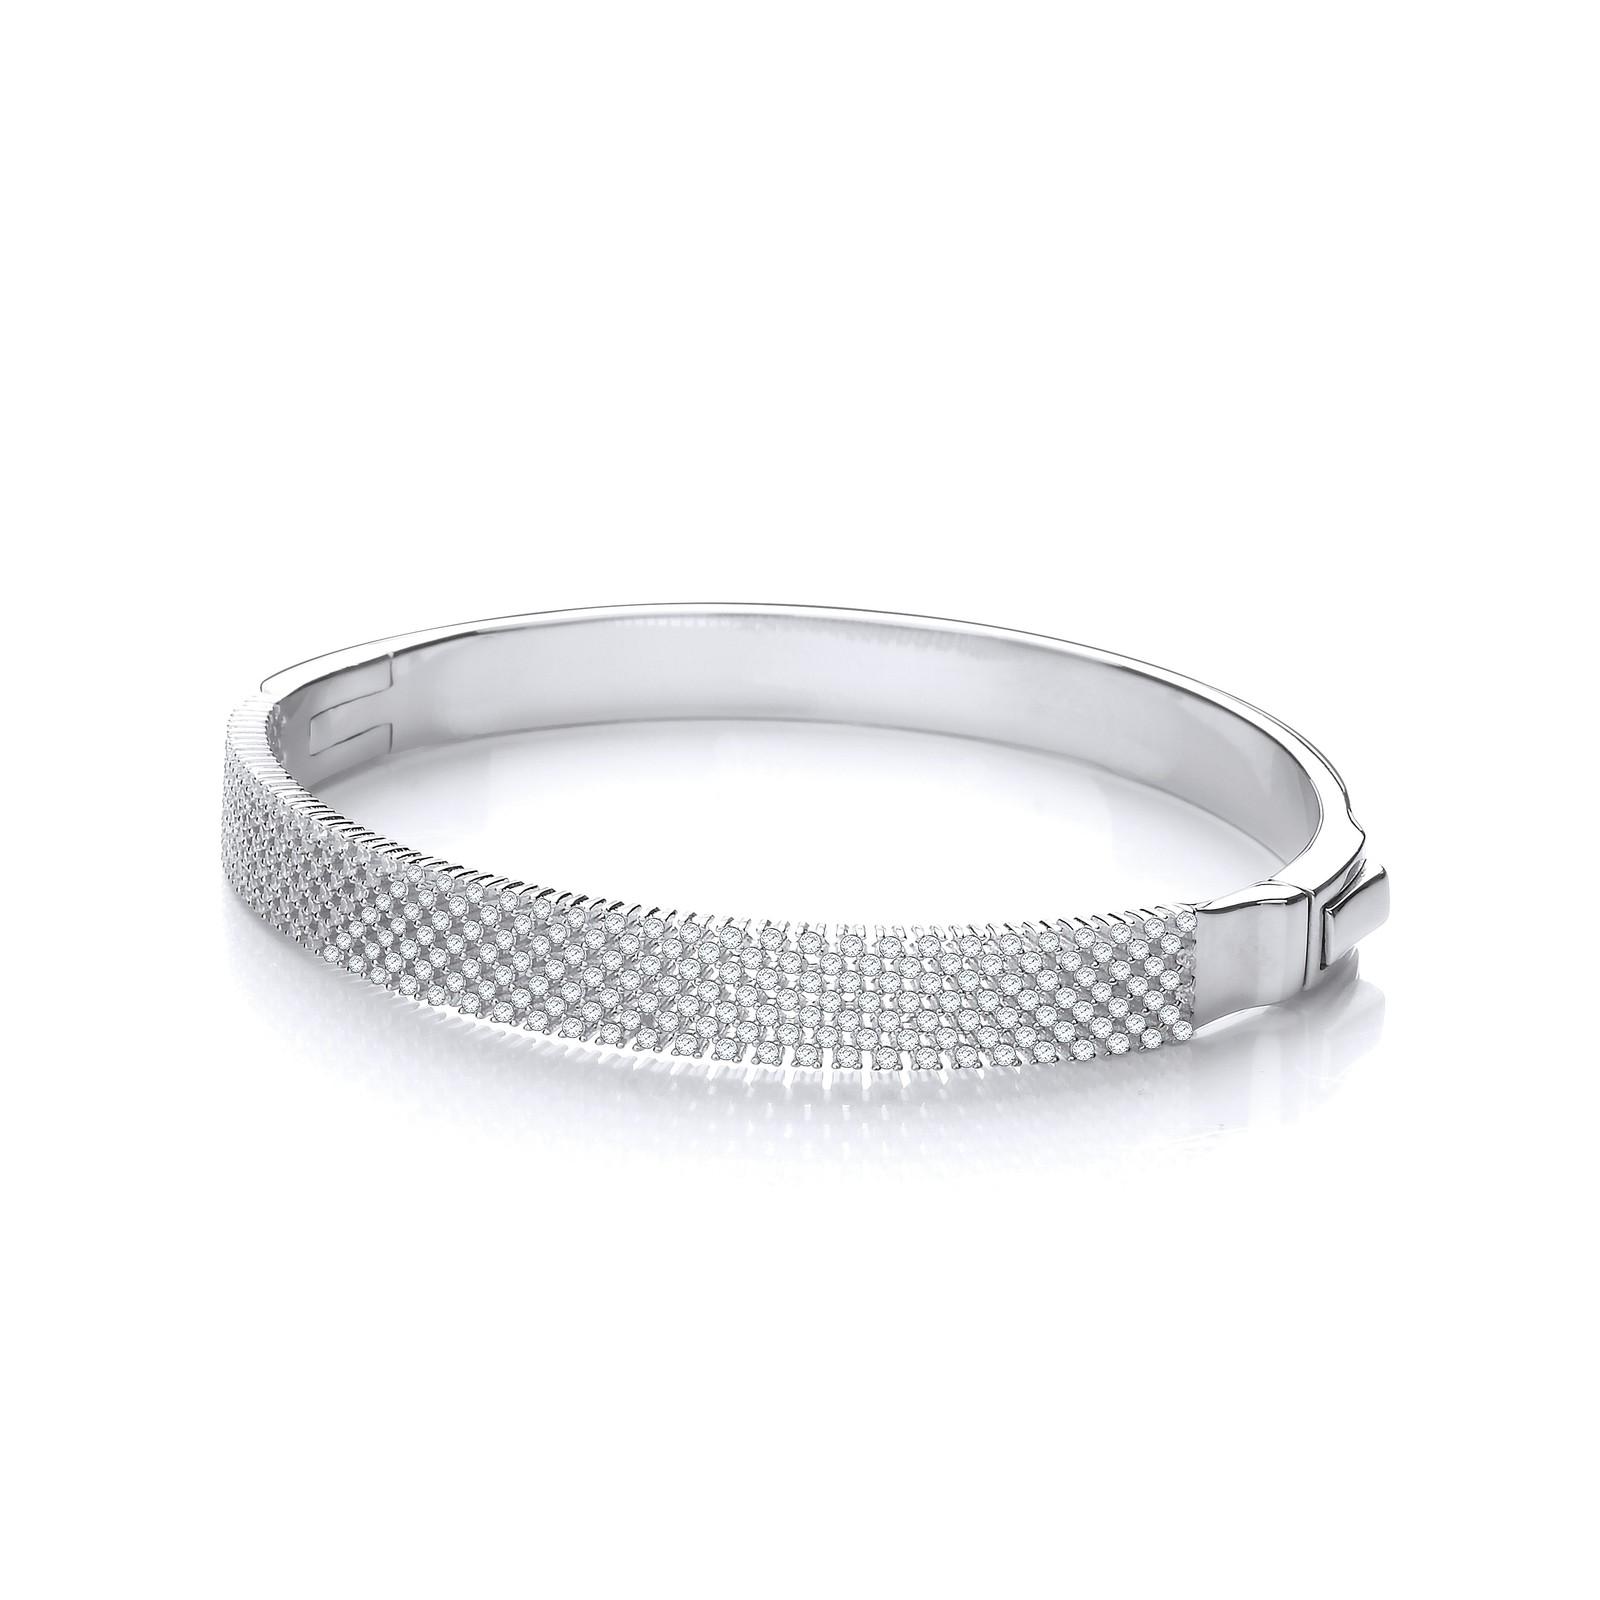 Micro Pave' Multi Row Cz Silver Bangle